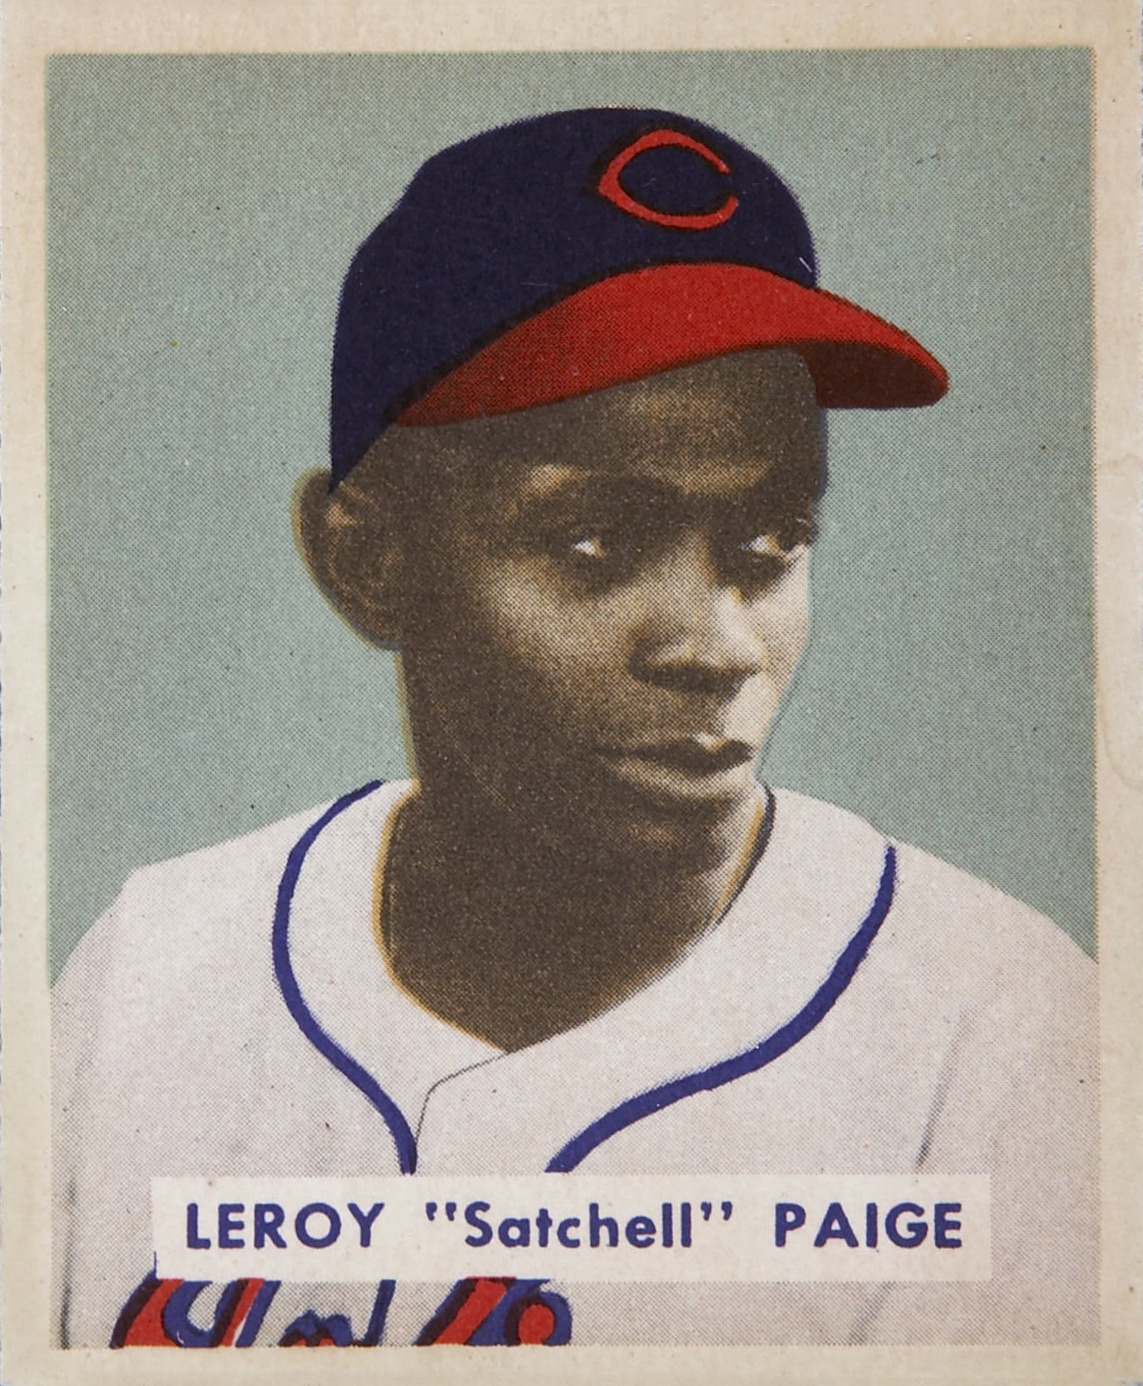 Leroy Satchel Paige